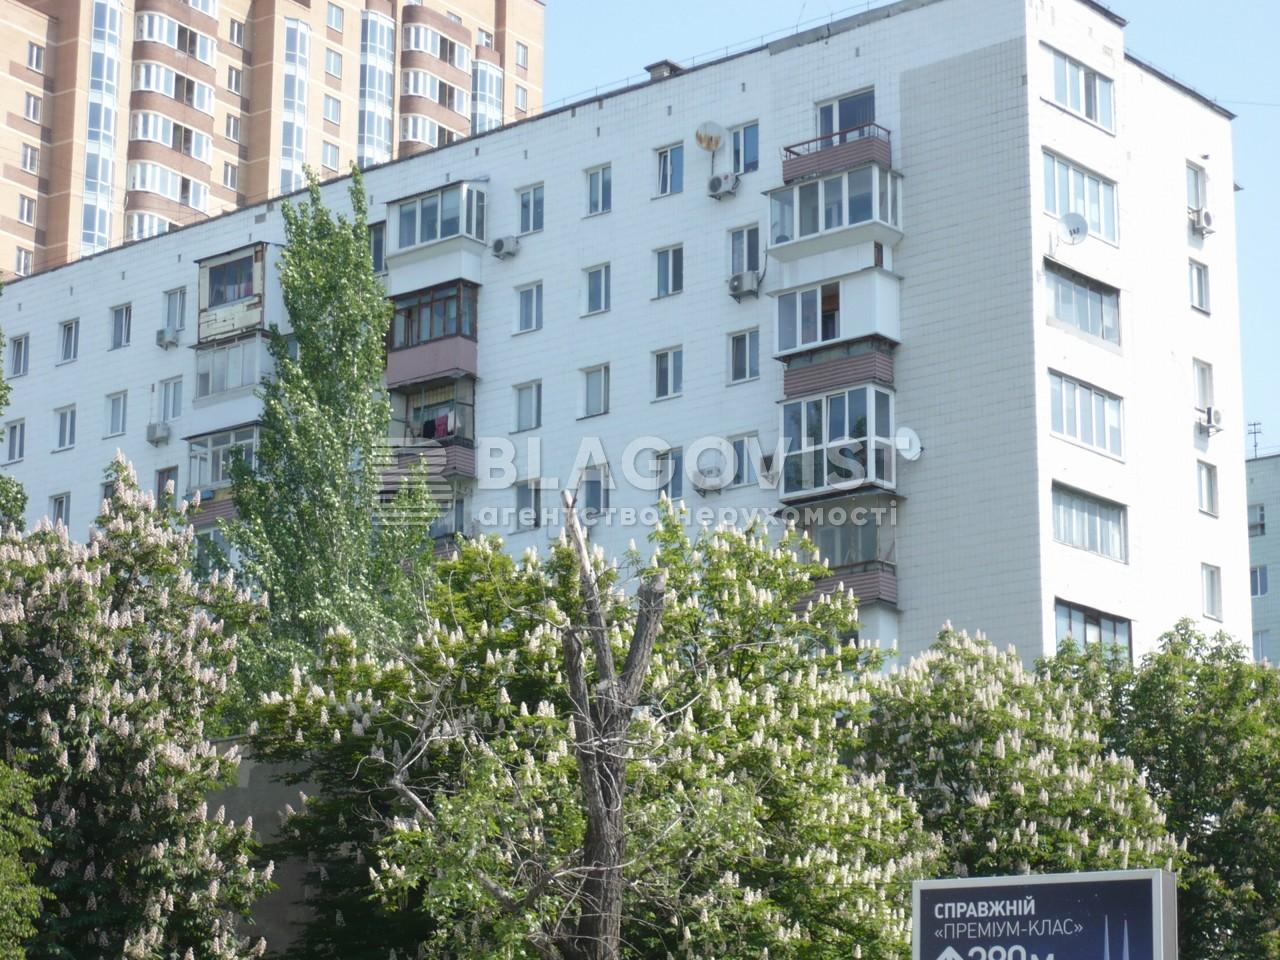 Нежитлове приміщення, D-33160, Коновальця Євгена (Щорса), Київ - Фото 1